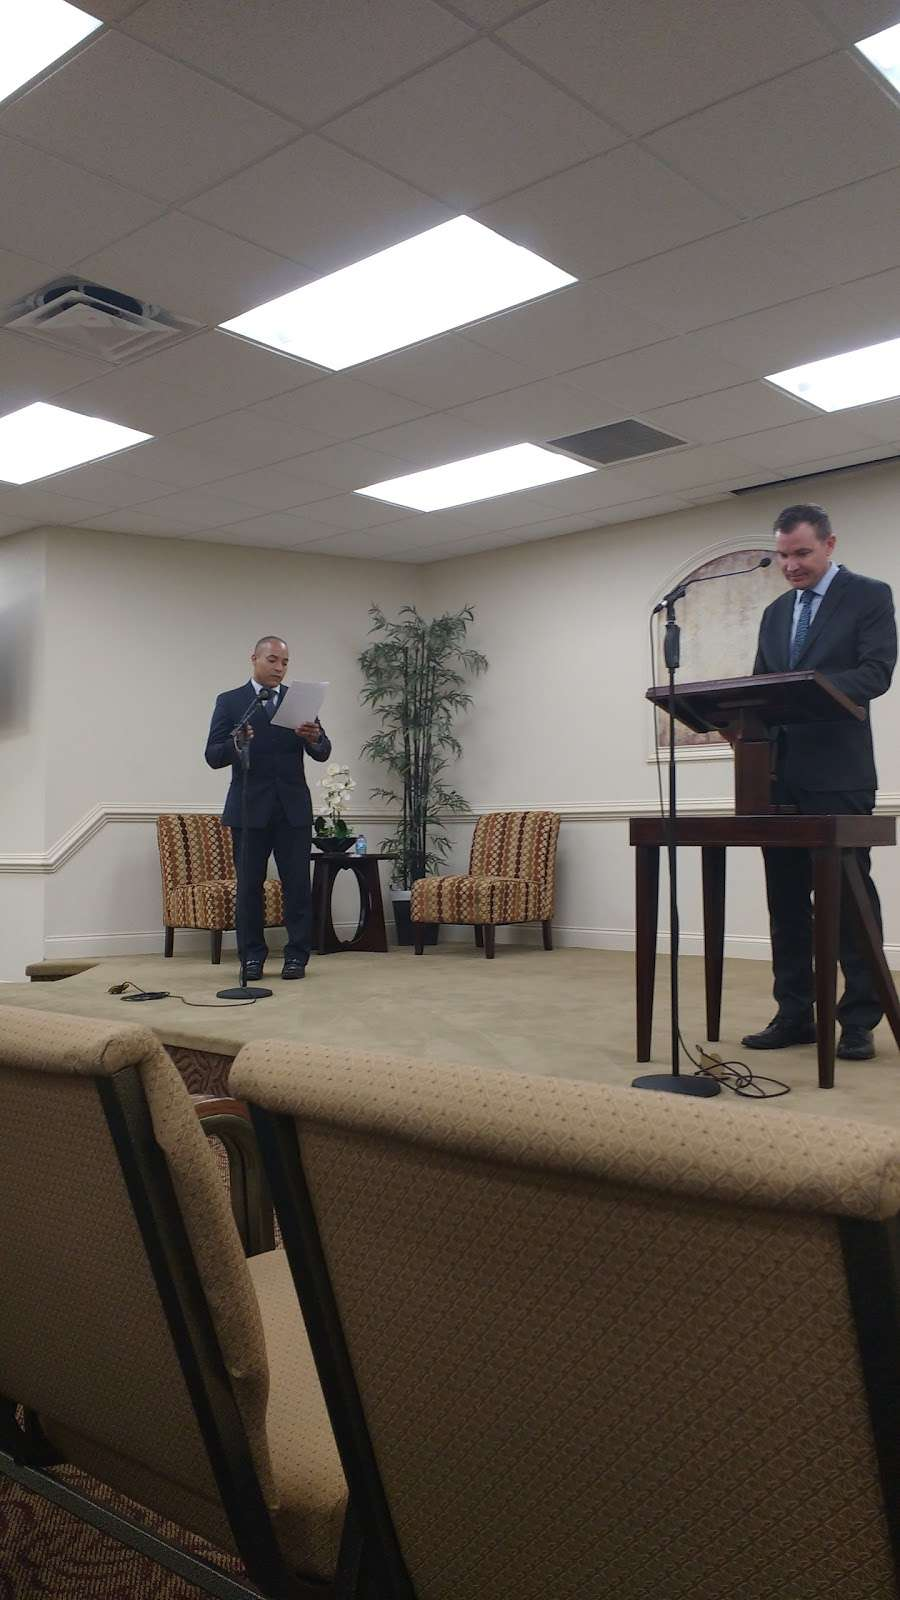 Kingdom Hall of Jehovahs Witnesses - church    Photo 6 of 8   Address: 4133 Redditt Rd, Orlando, FL 32822, USA   Phone: (407) 275-7060